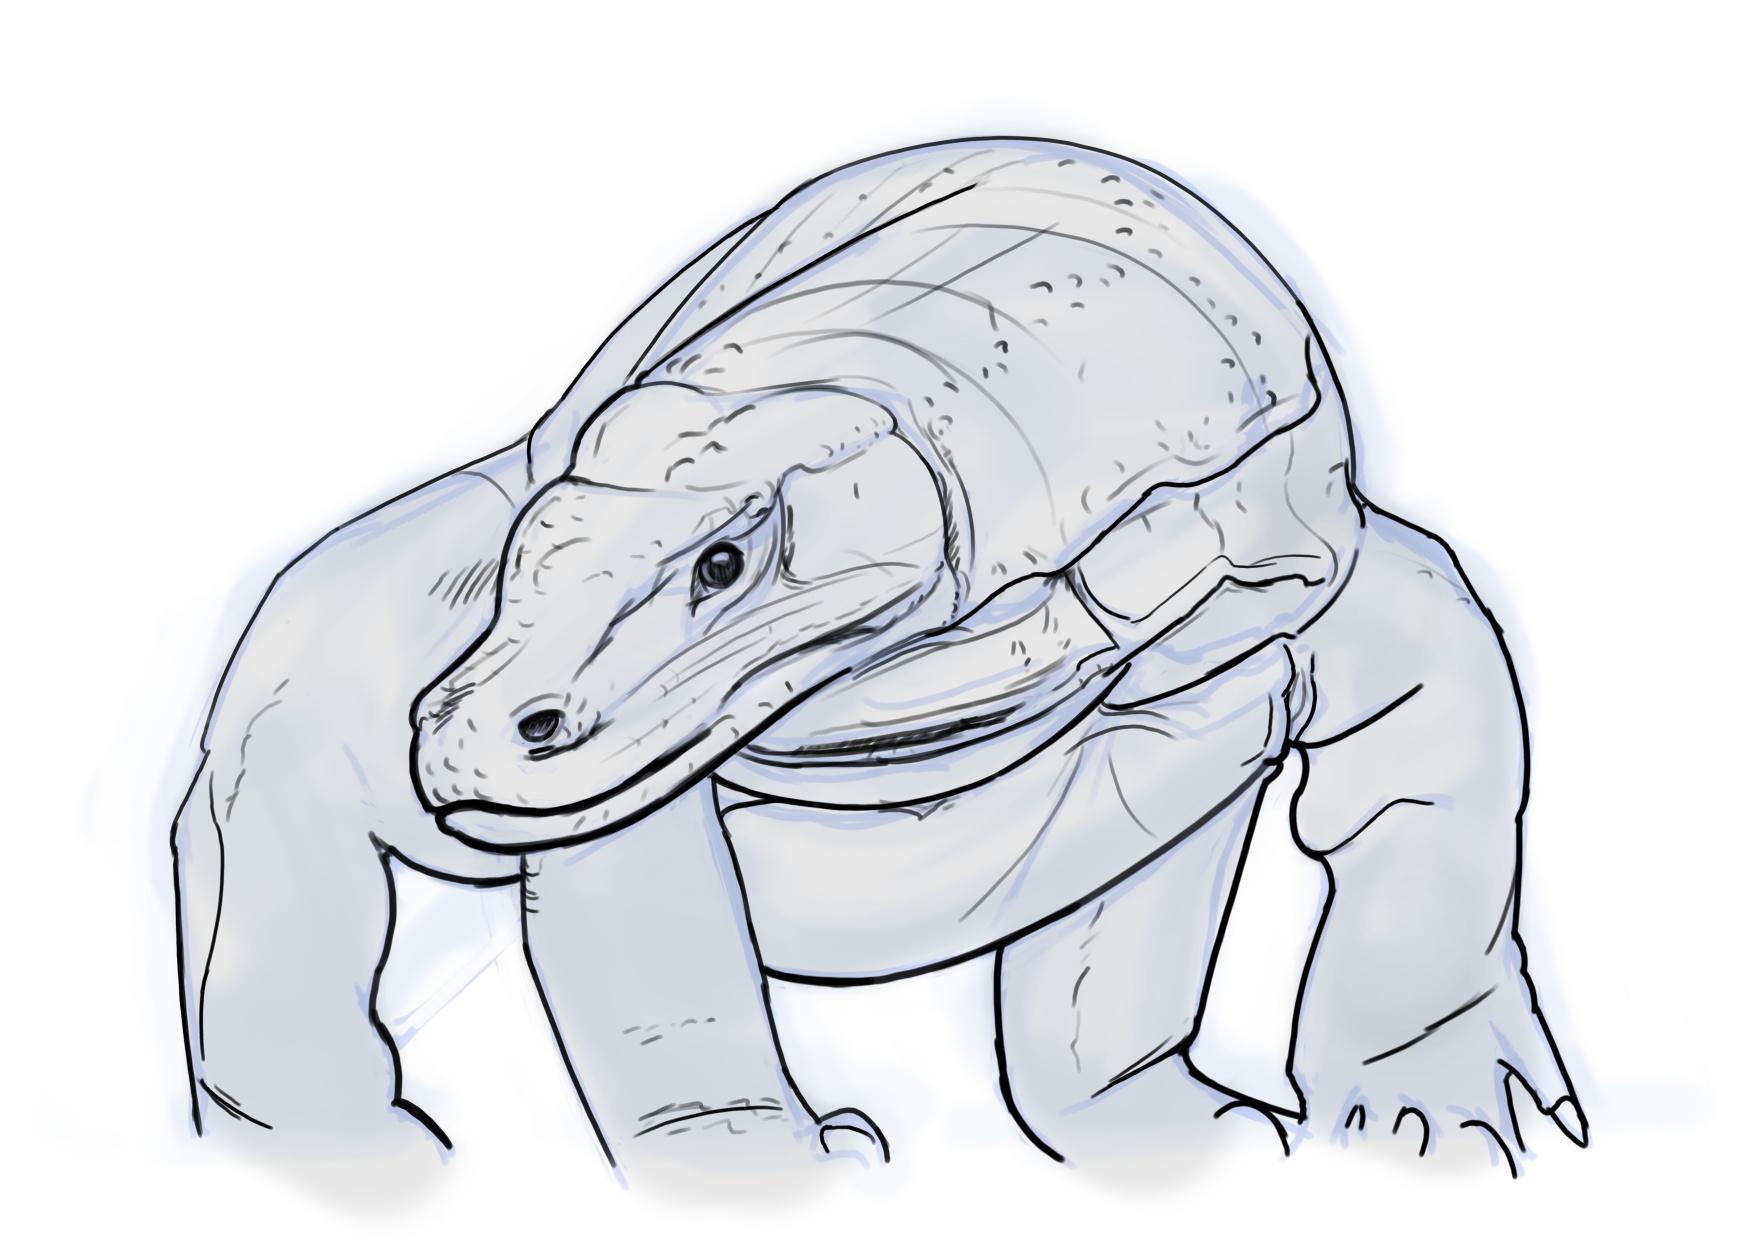 Sketching Lines Komodo Dragon '�  Weasyl How To Draw A Komodo Dragon  Solution For How